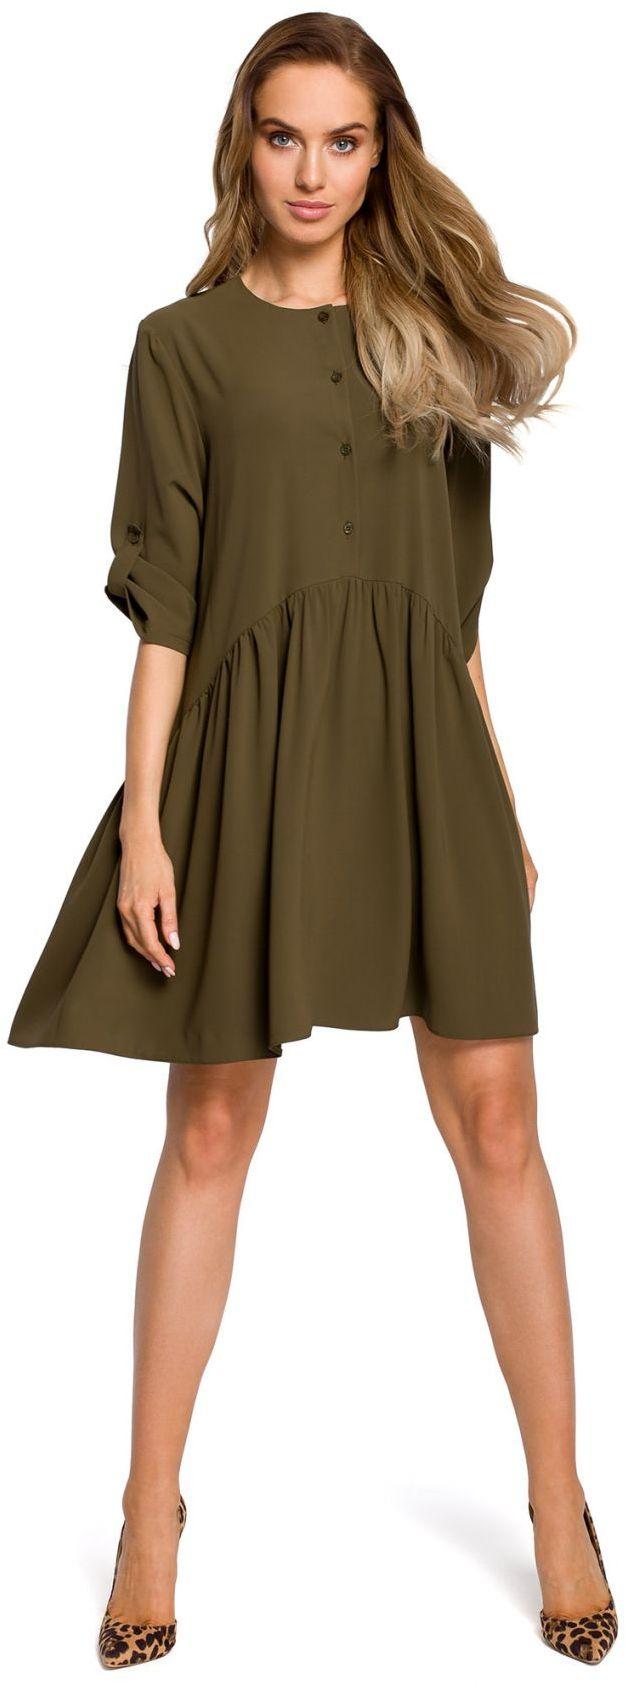 M427 Luźna sukienka marszczona w pasie - khaki